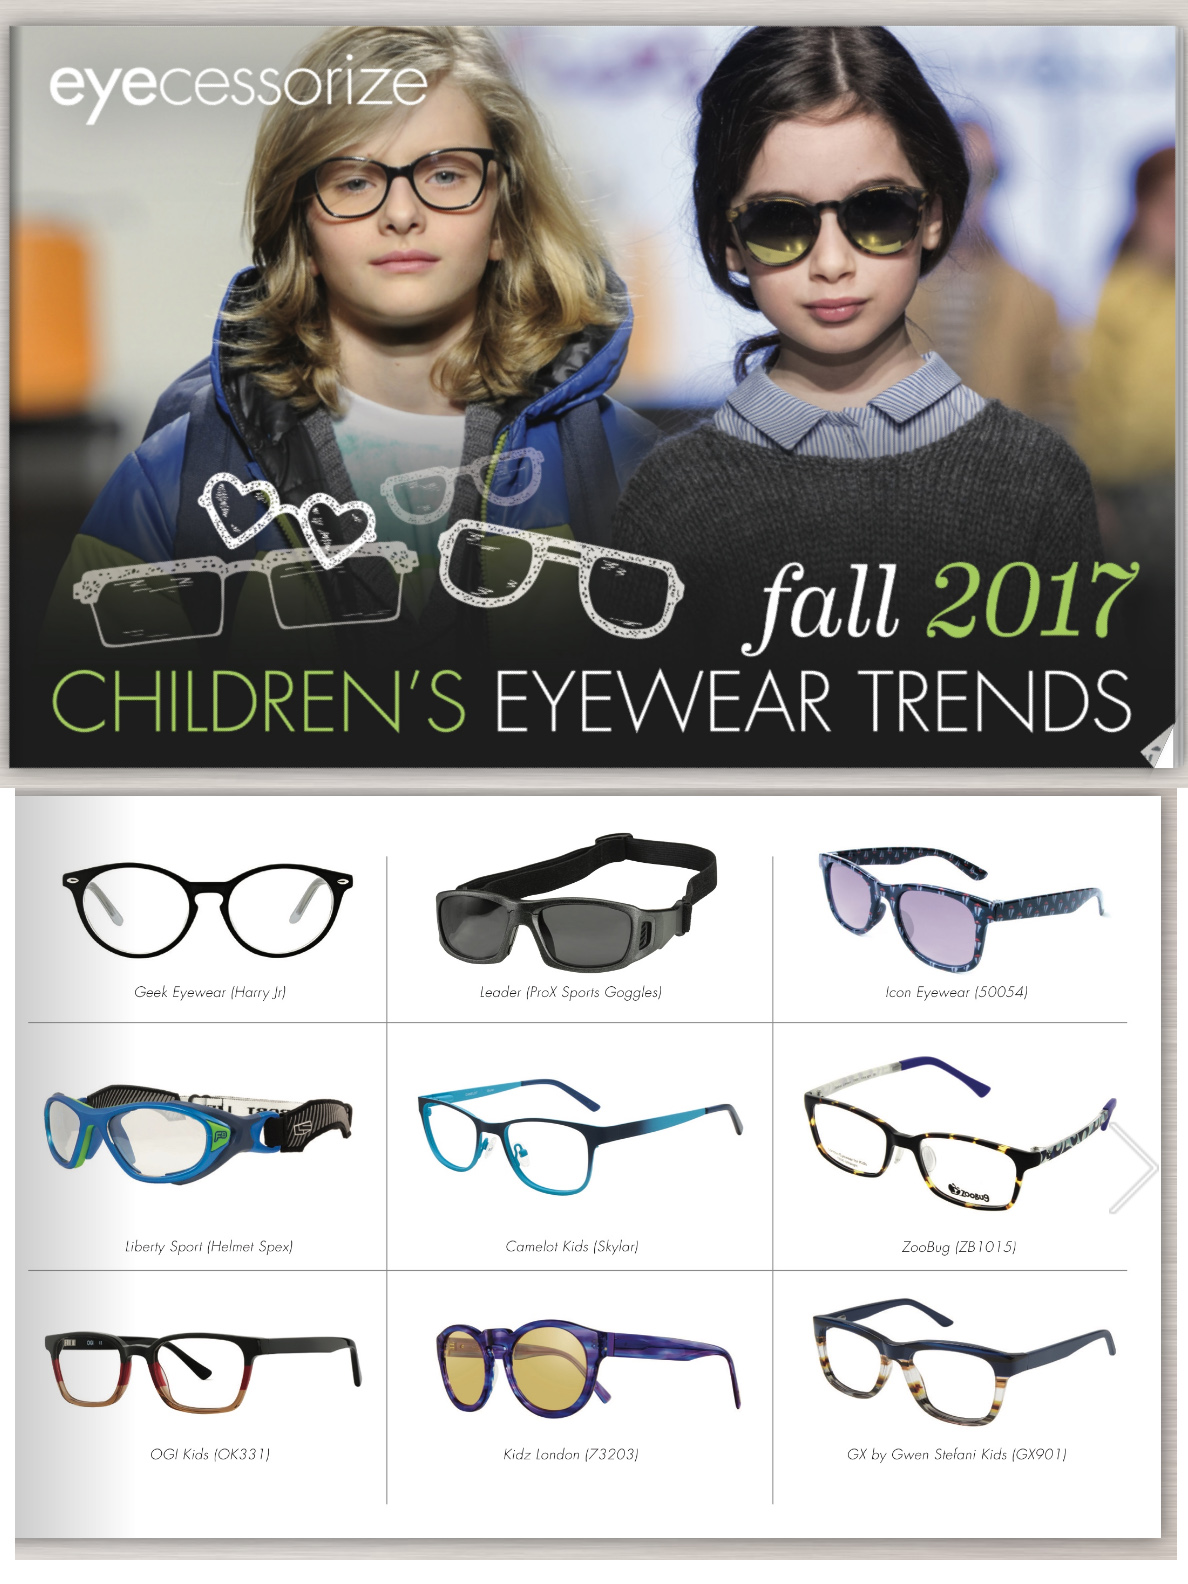 geek-eyewear-in-eyecessorize-boys-details